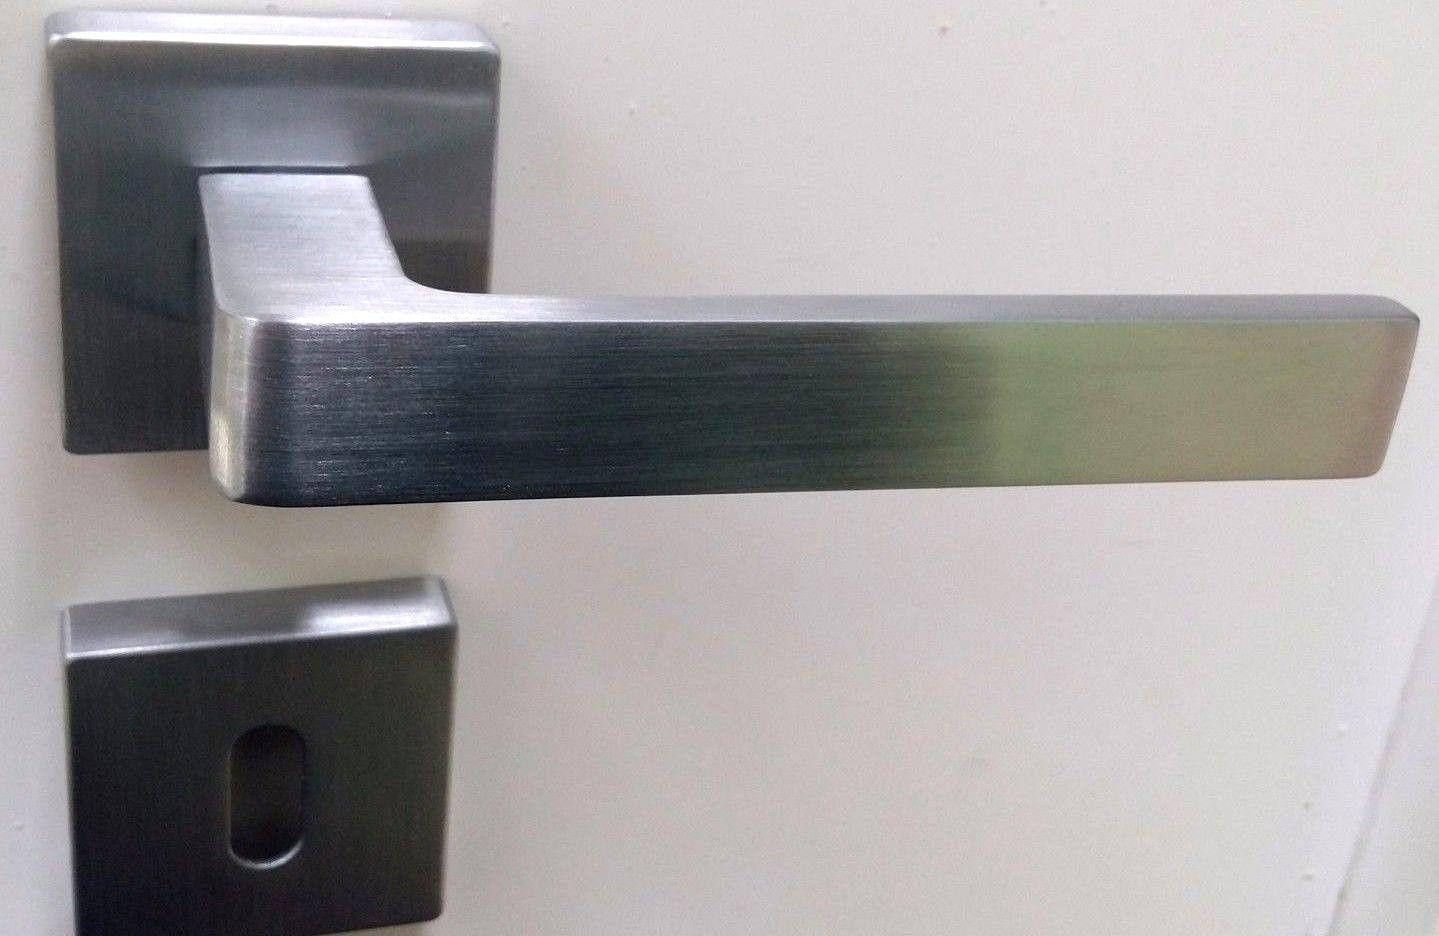 Migliori Maniglie Per Porte Interne maniglie per porte interne quadrate moderne cromo satinato